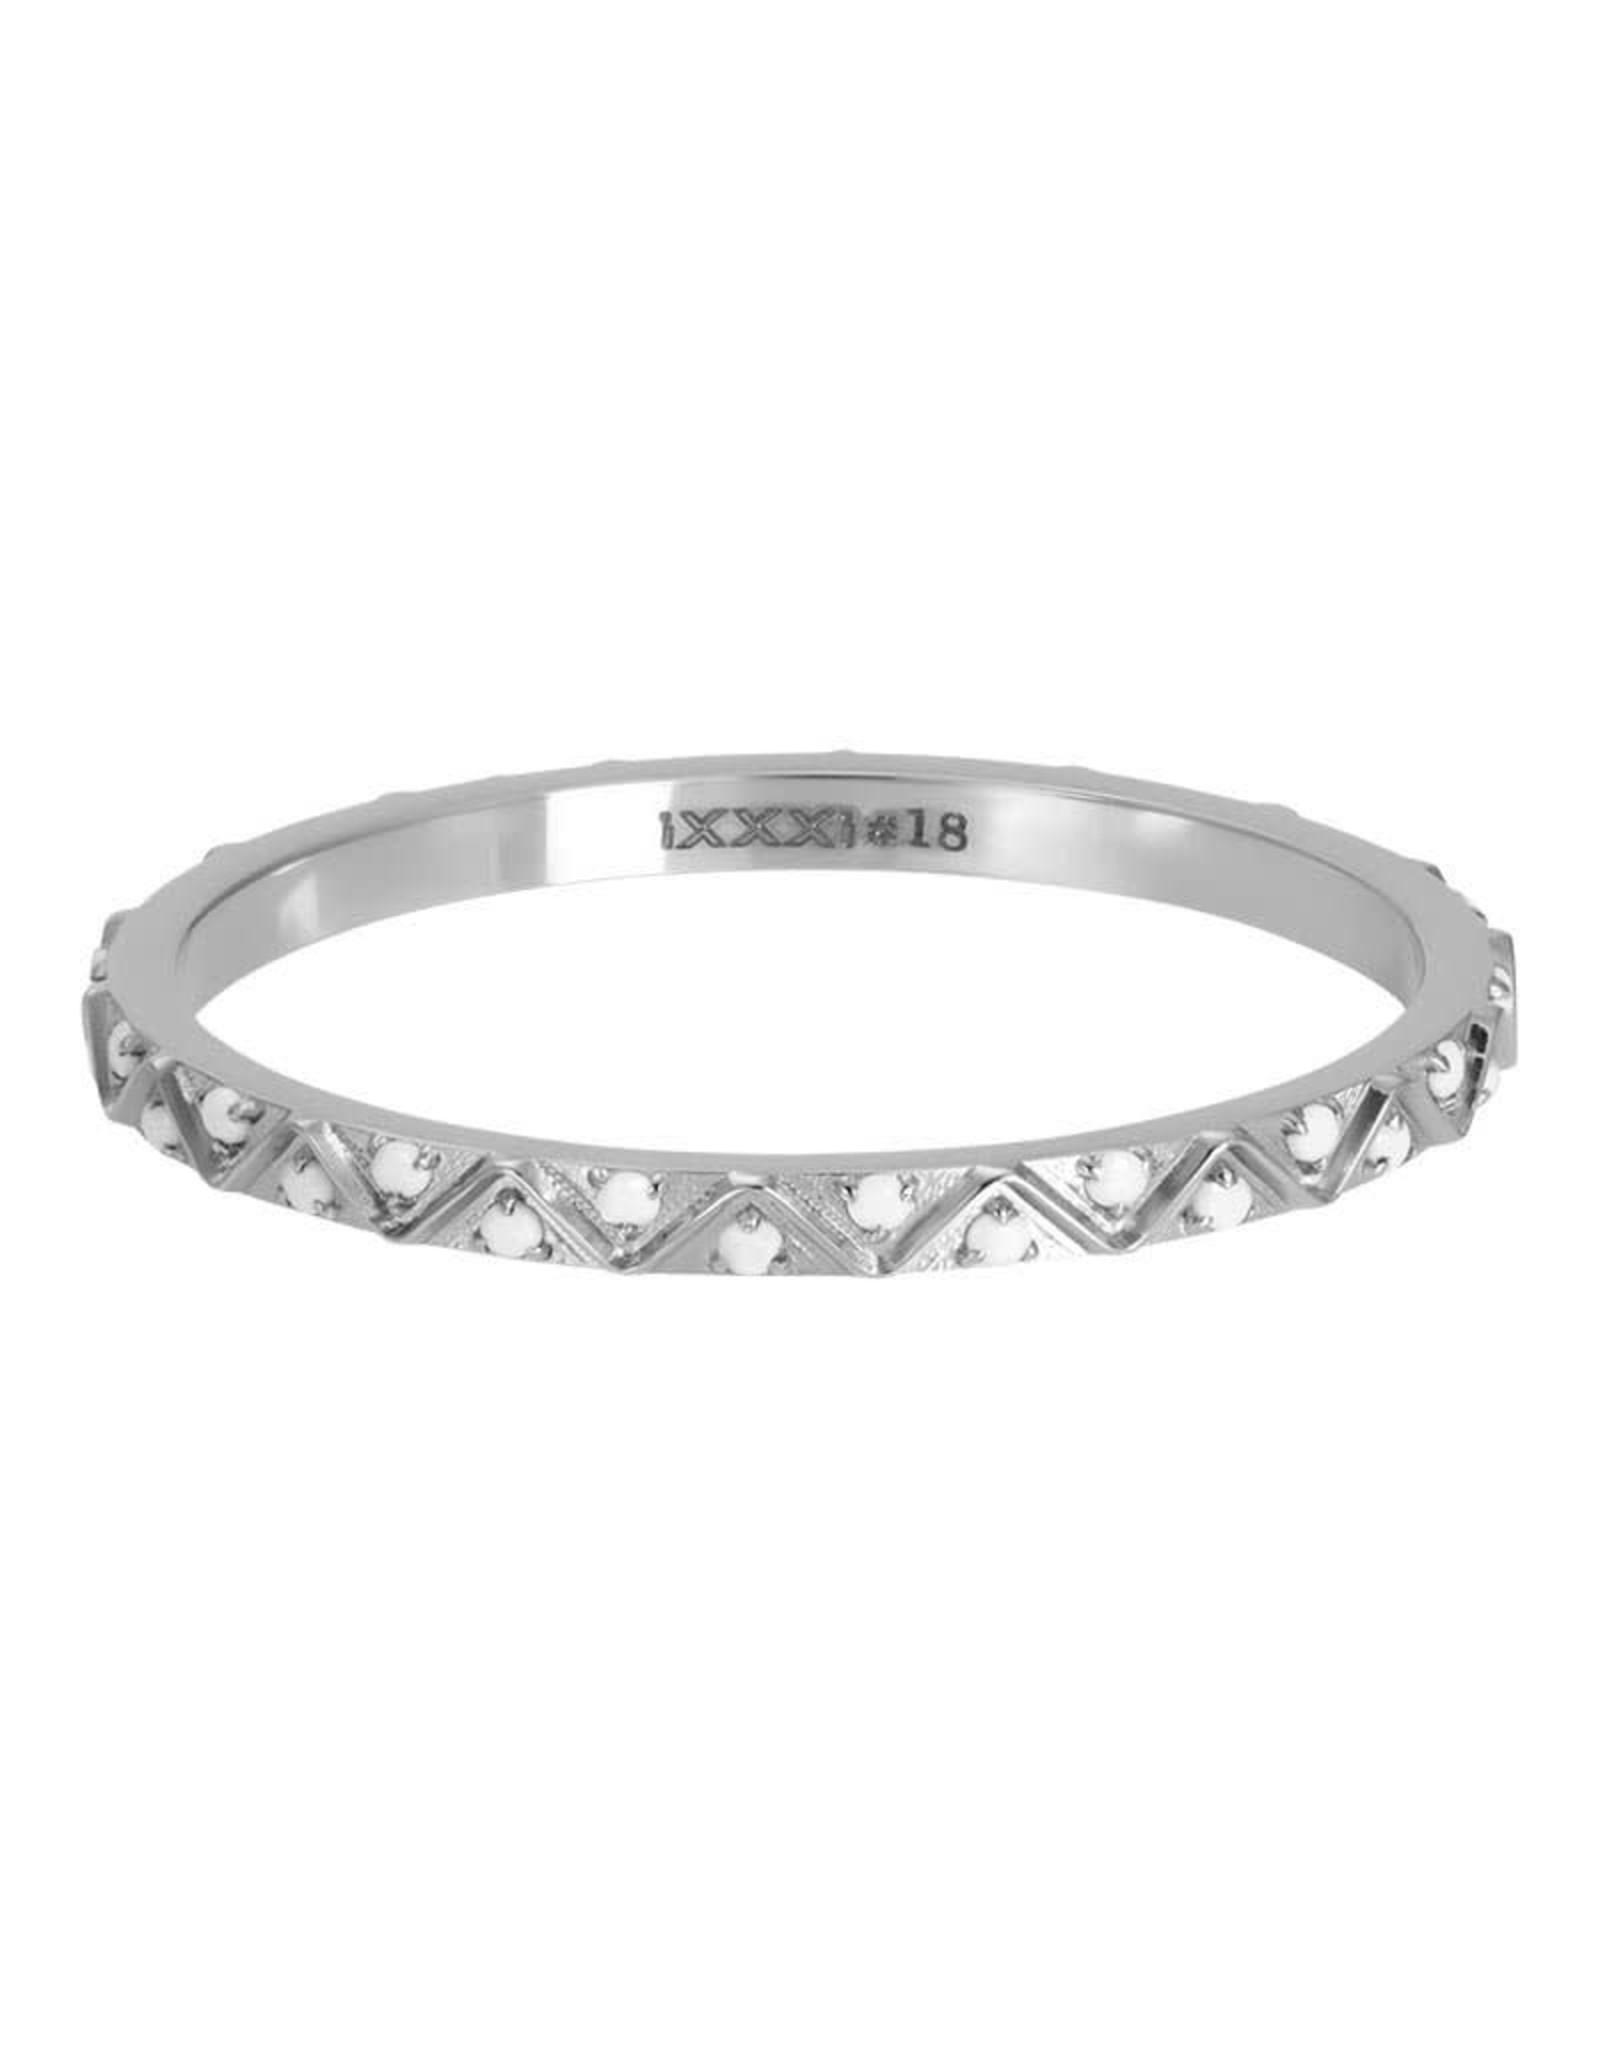 iXXXi Jewelry iXXXi vulring bohemian opal